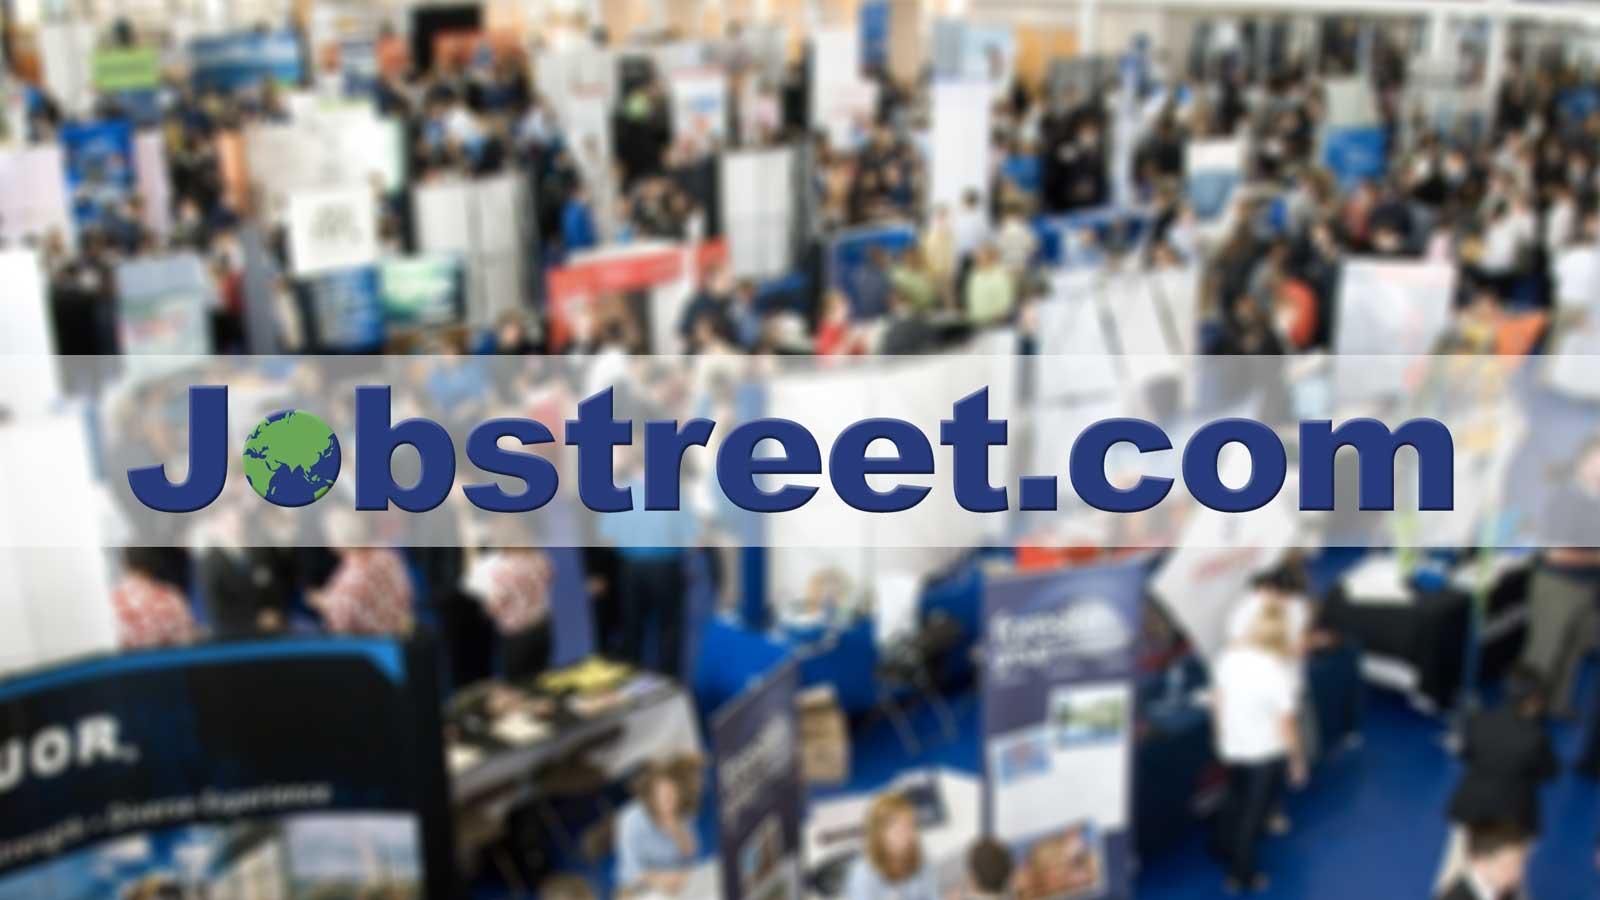 Utilities companies make the top 10 companies of Jobstreet.com for 2017